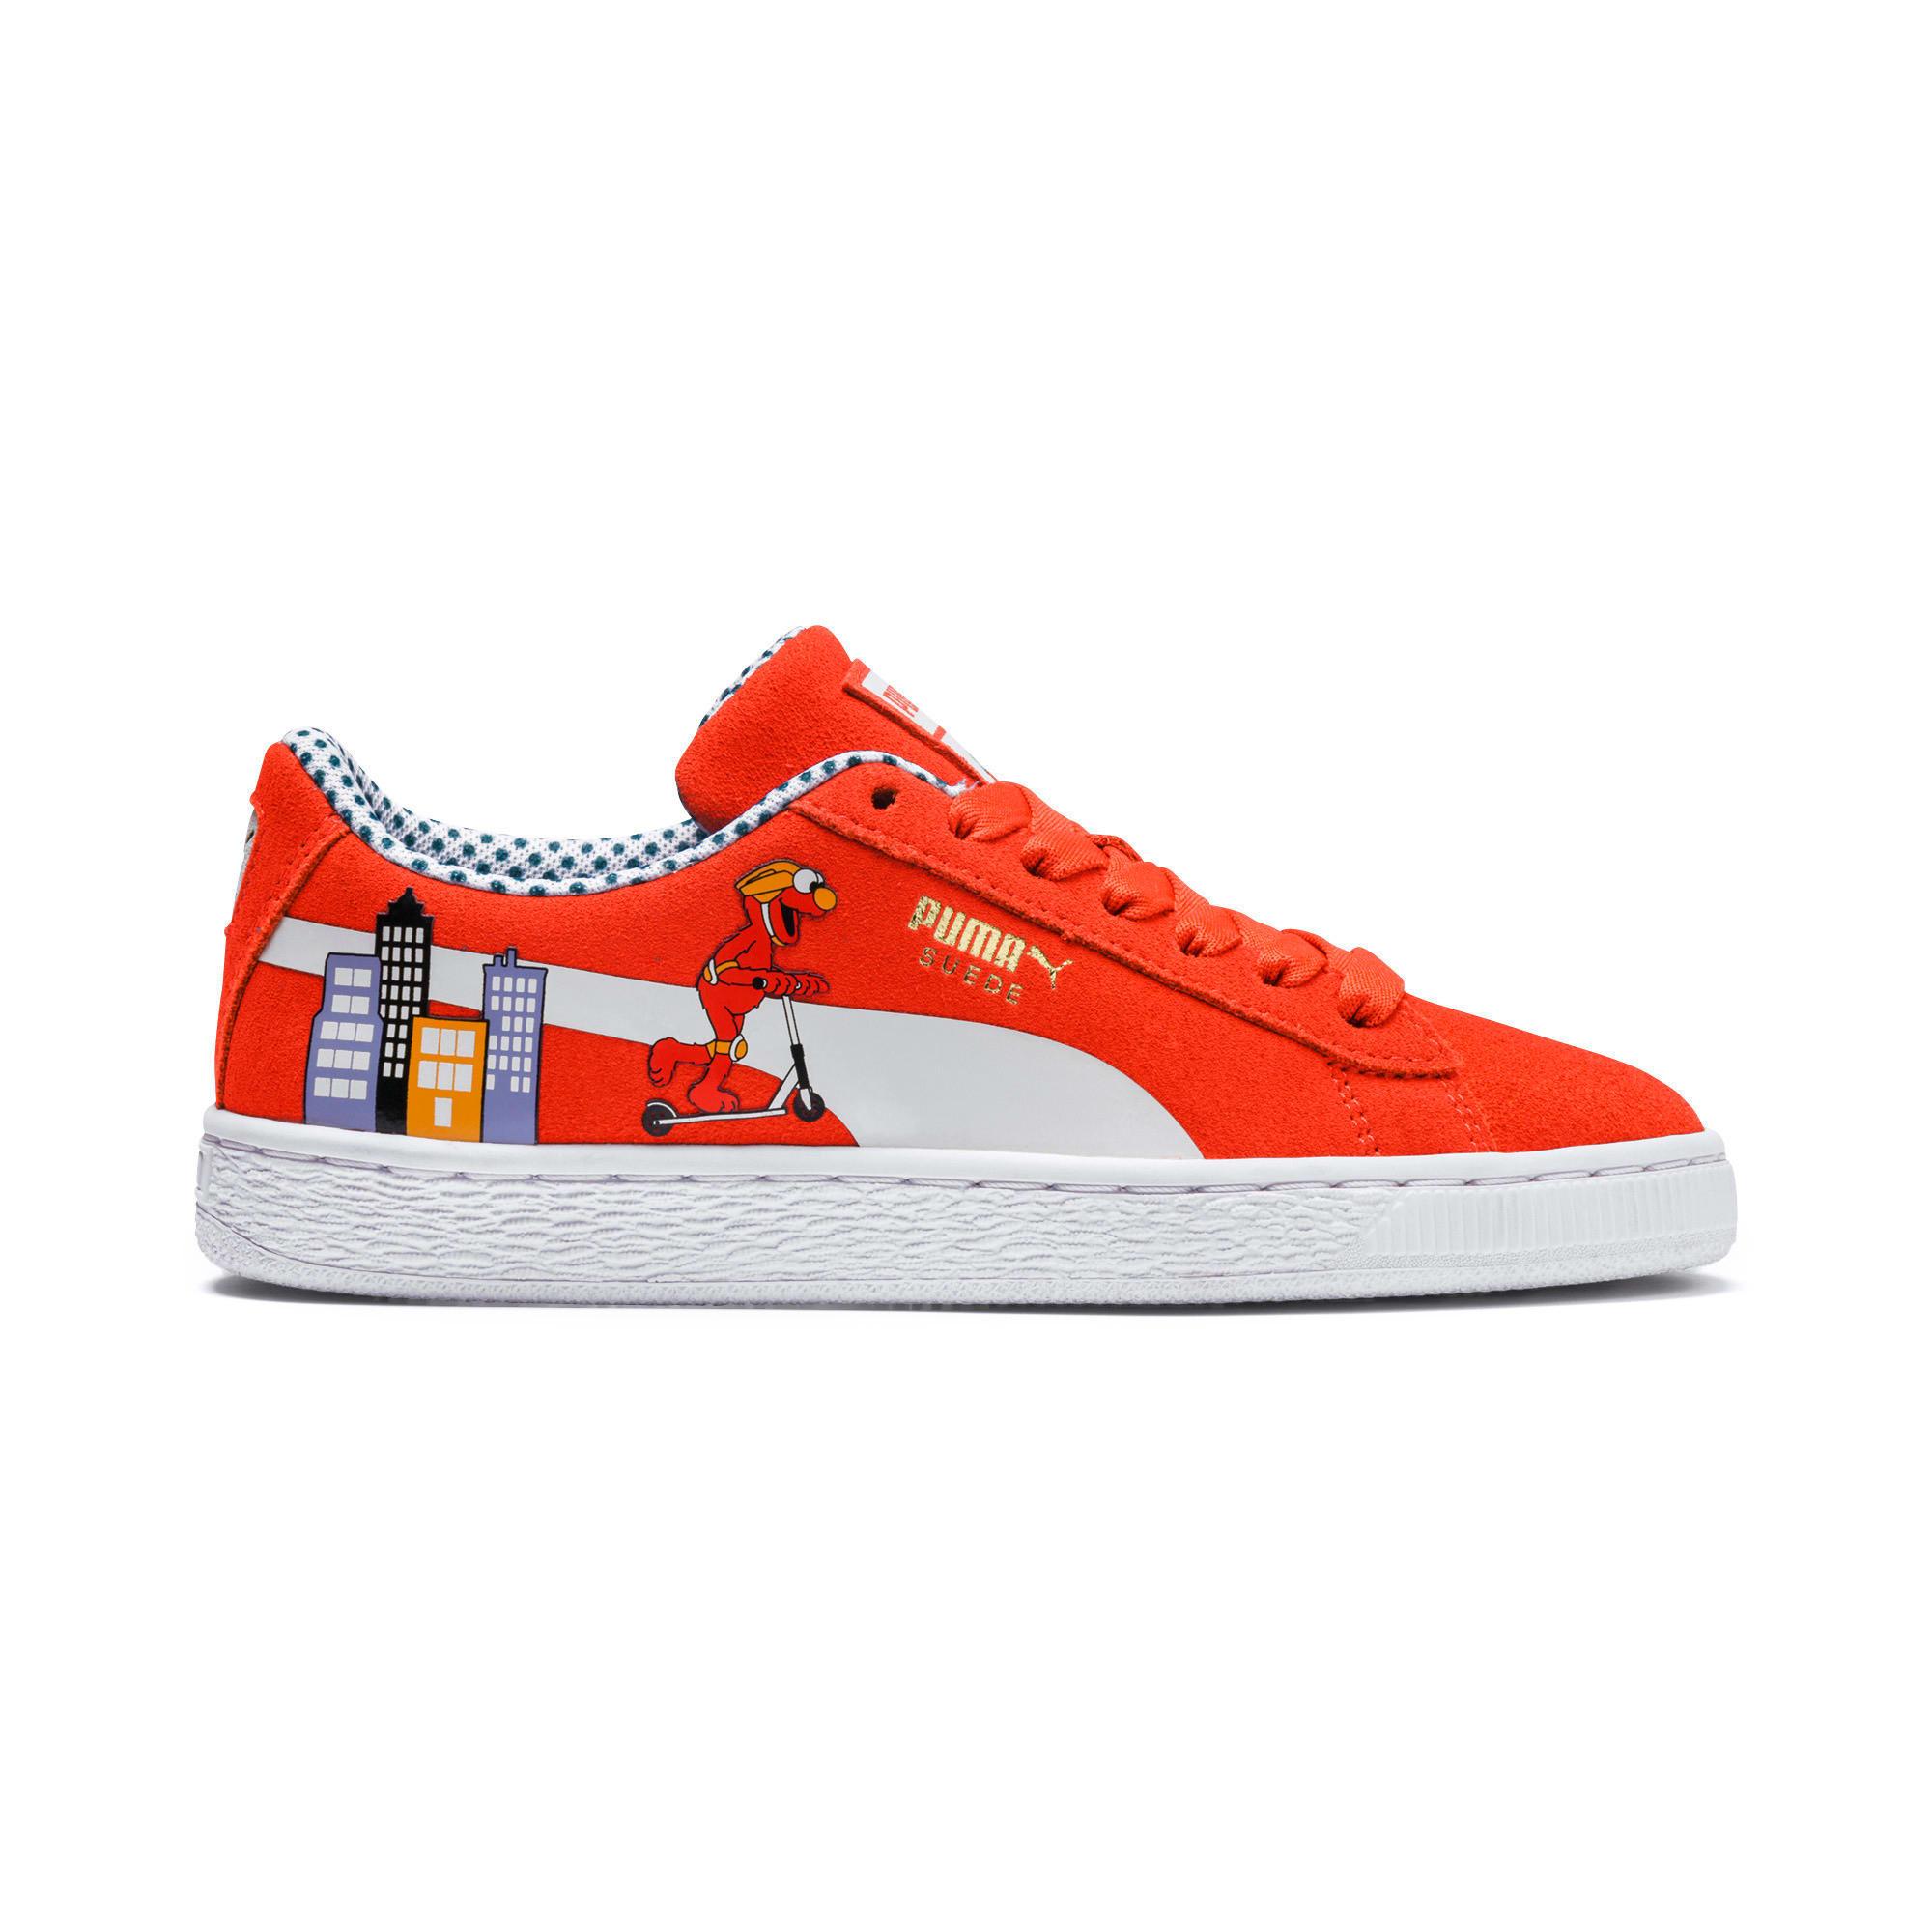 Thumbnail 7 of Sesame Street 50 Suede Sneakers JR, Cherry Tomato-Puma White, medium